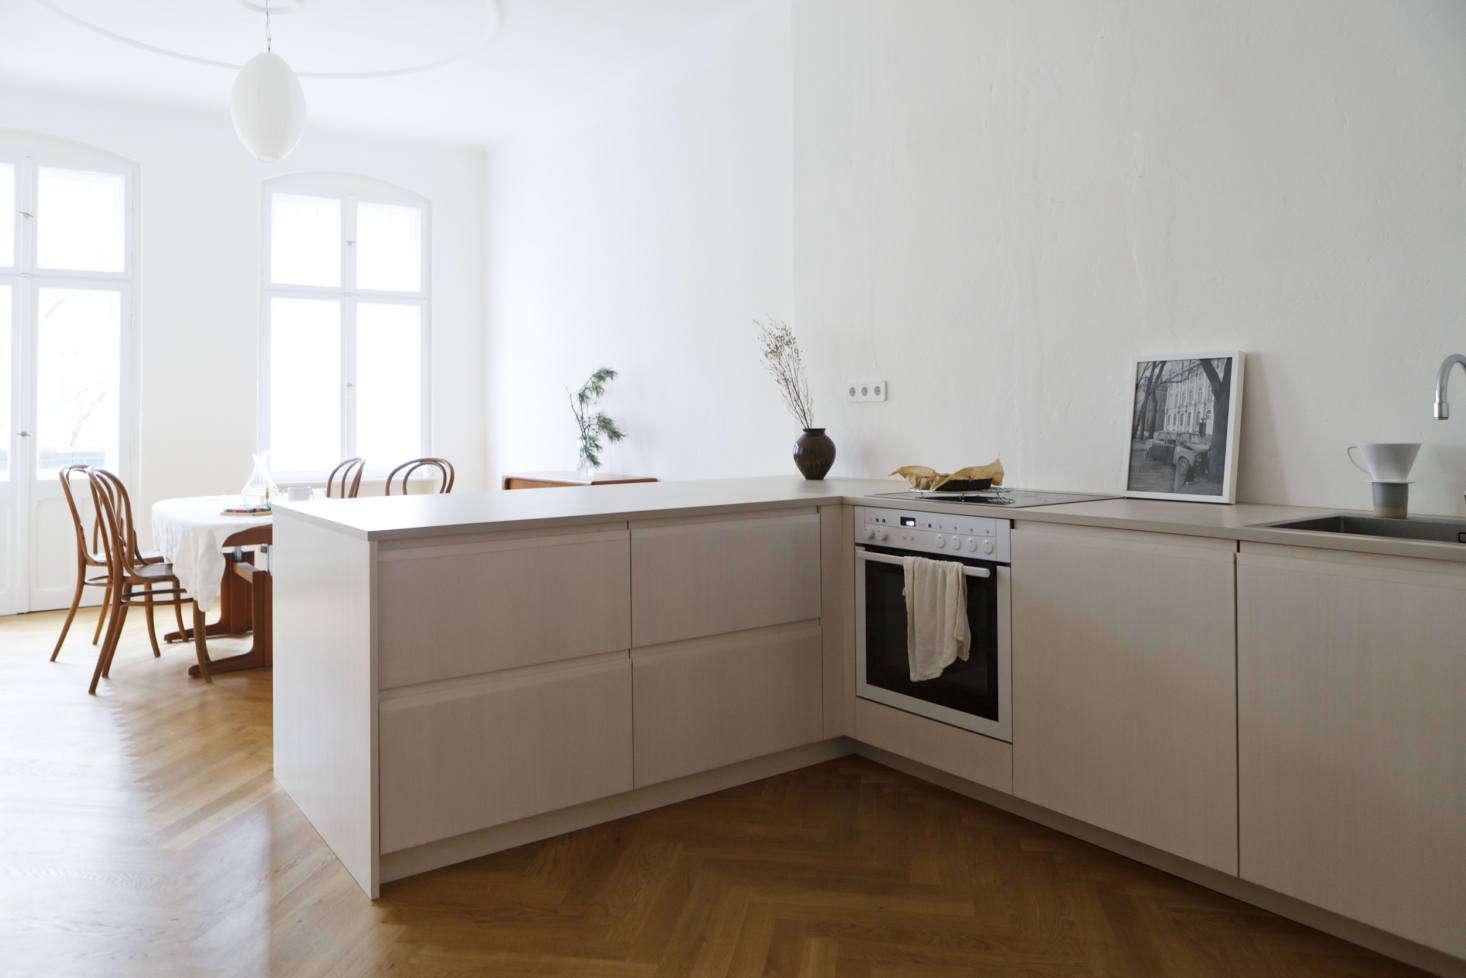 https://cdn.remodelista.com/wp-content/uploads/2018/03/berlin-apartment-kitchen-by-studio-oink-7-1466x978.jpg